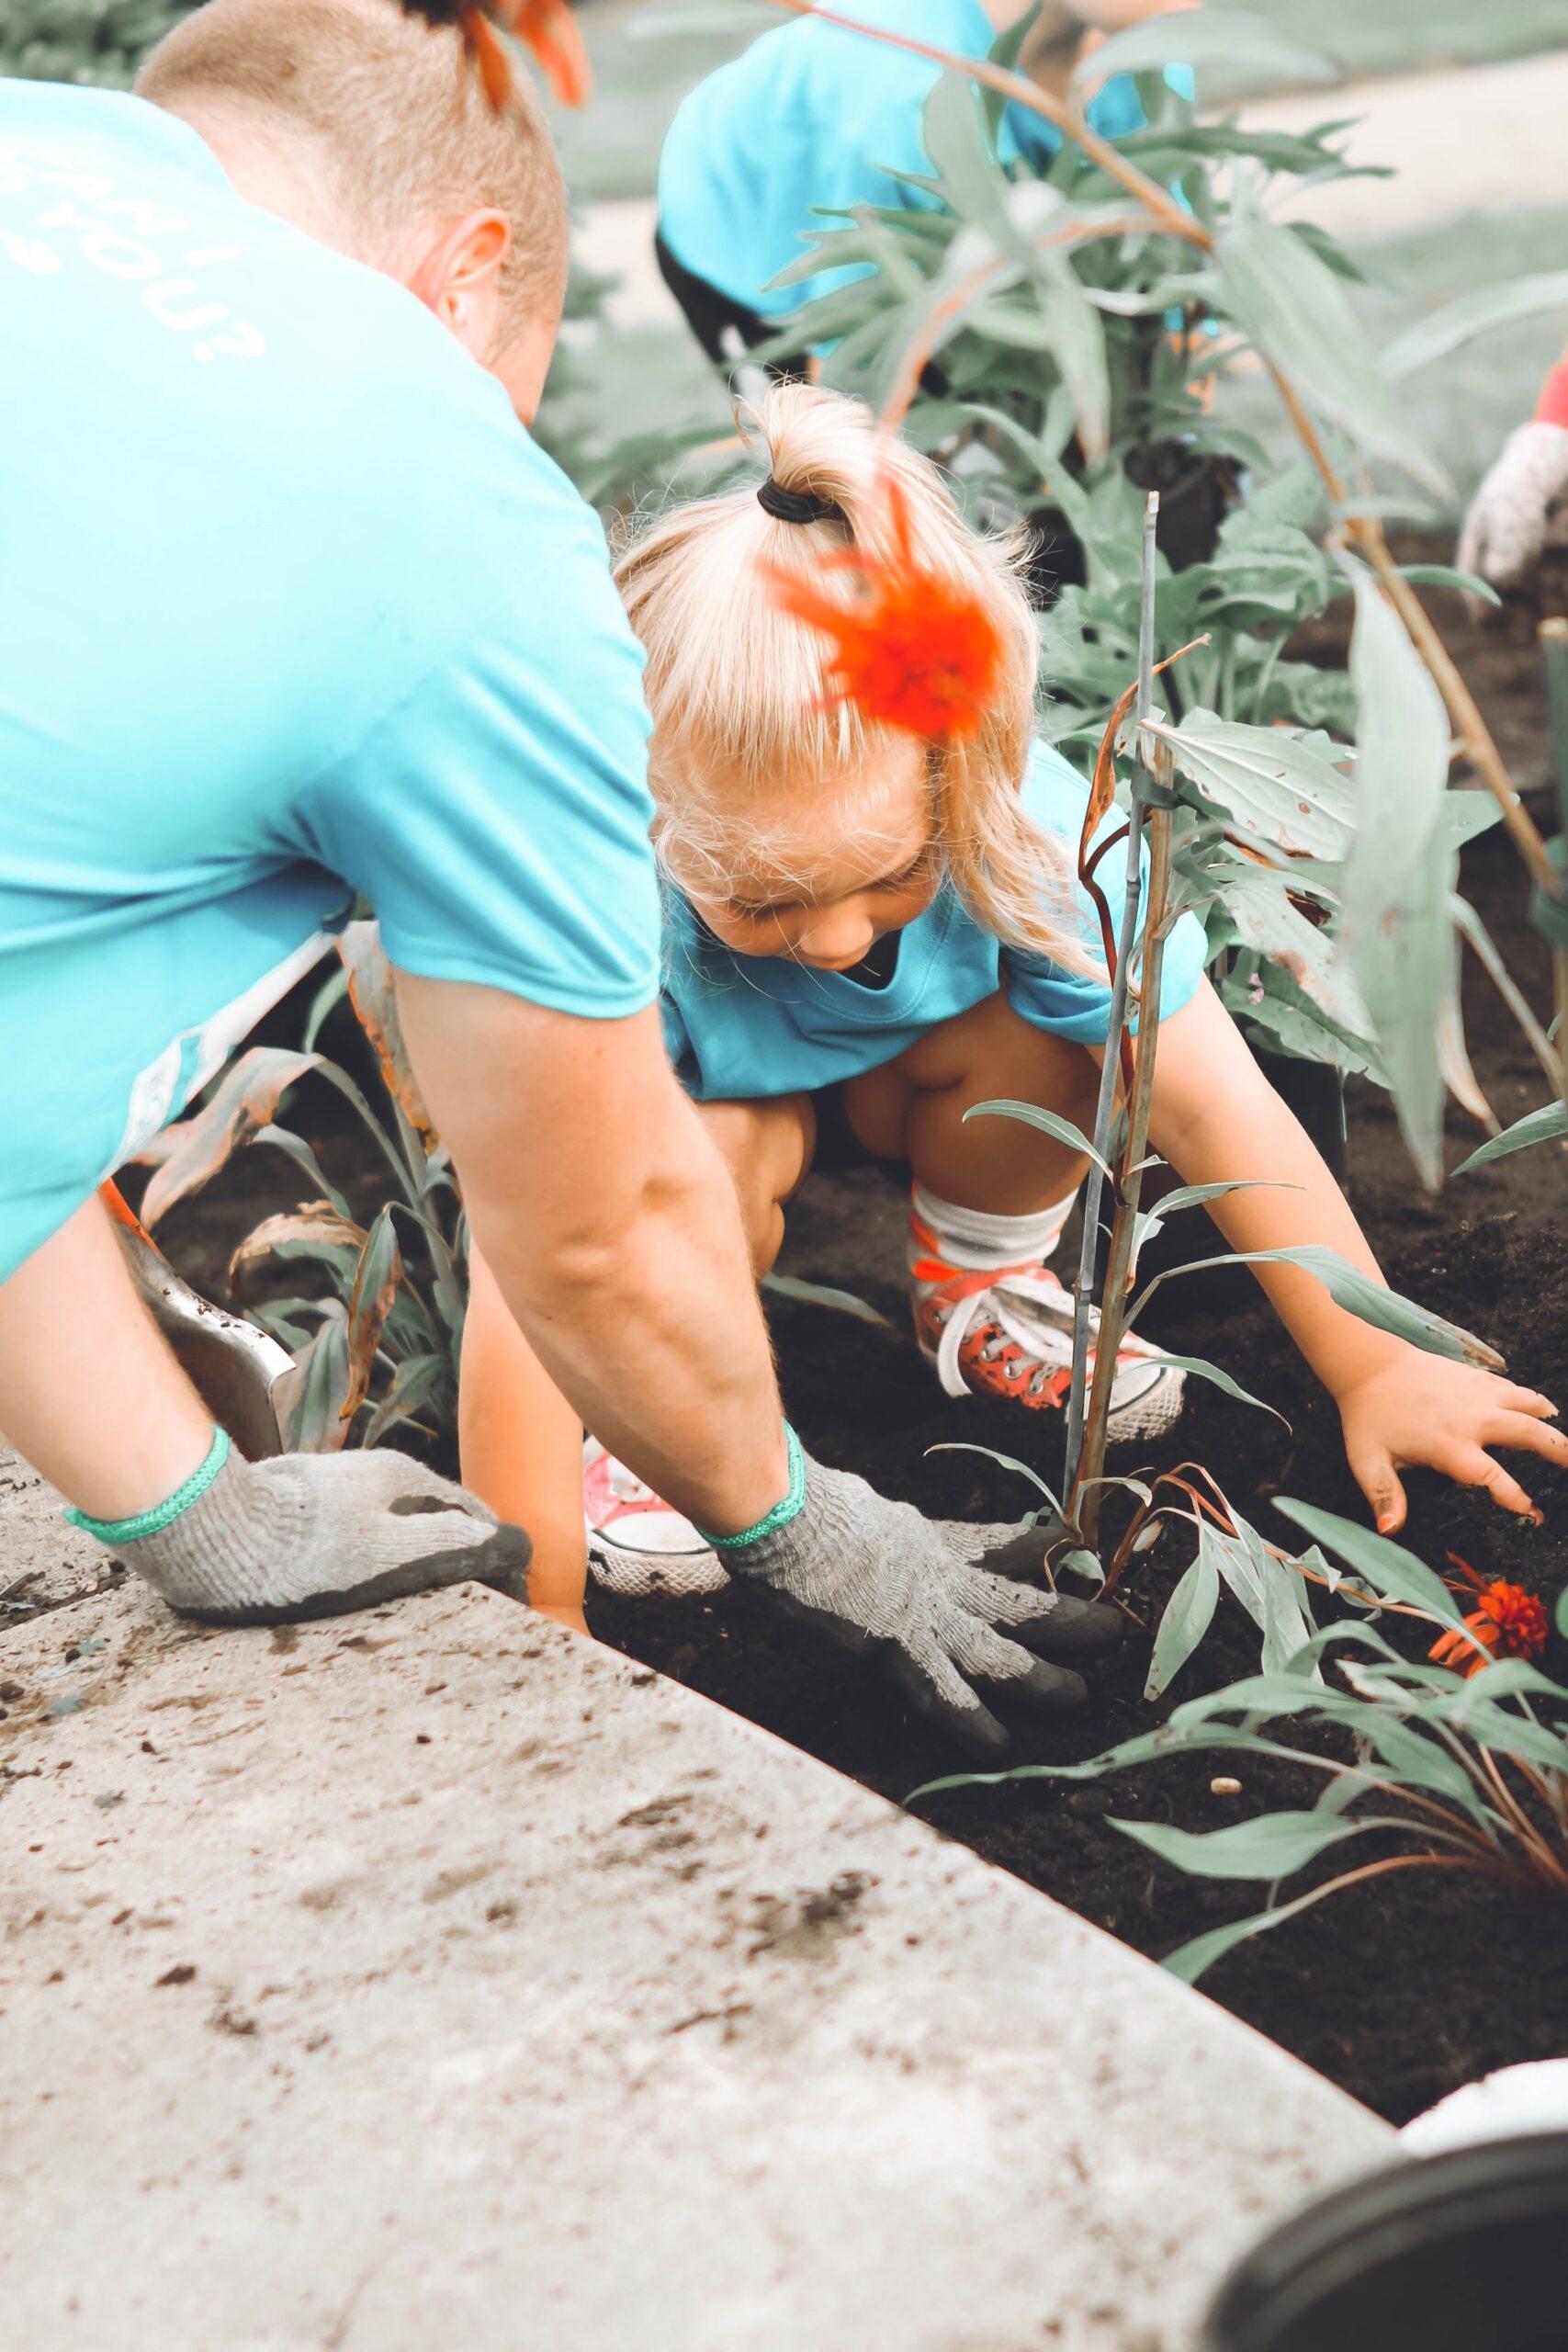 Man helping girl by volunteering. Photo by Anna Earl on Unsplash